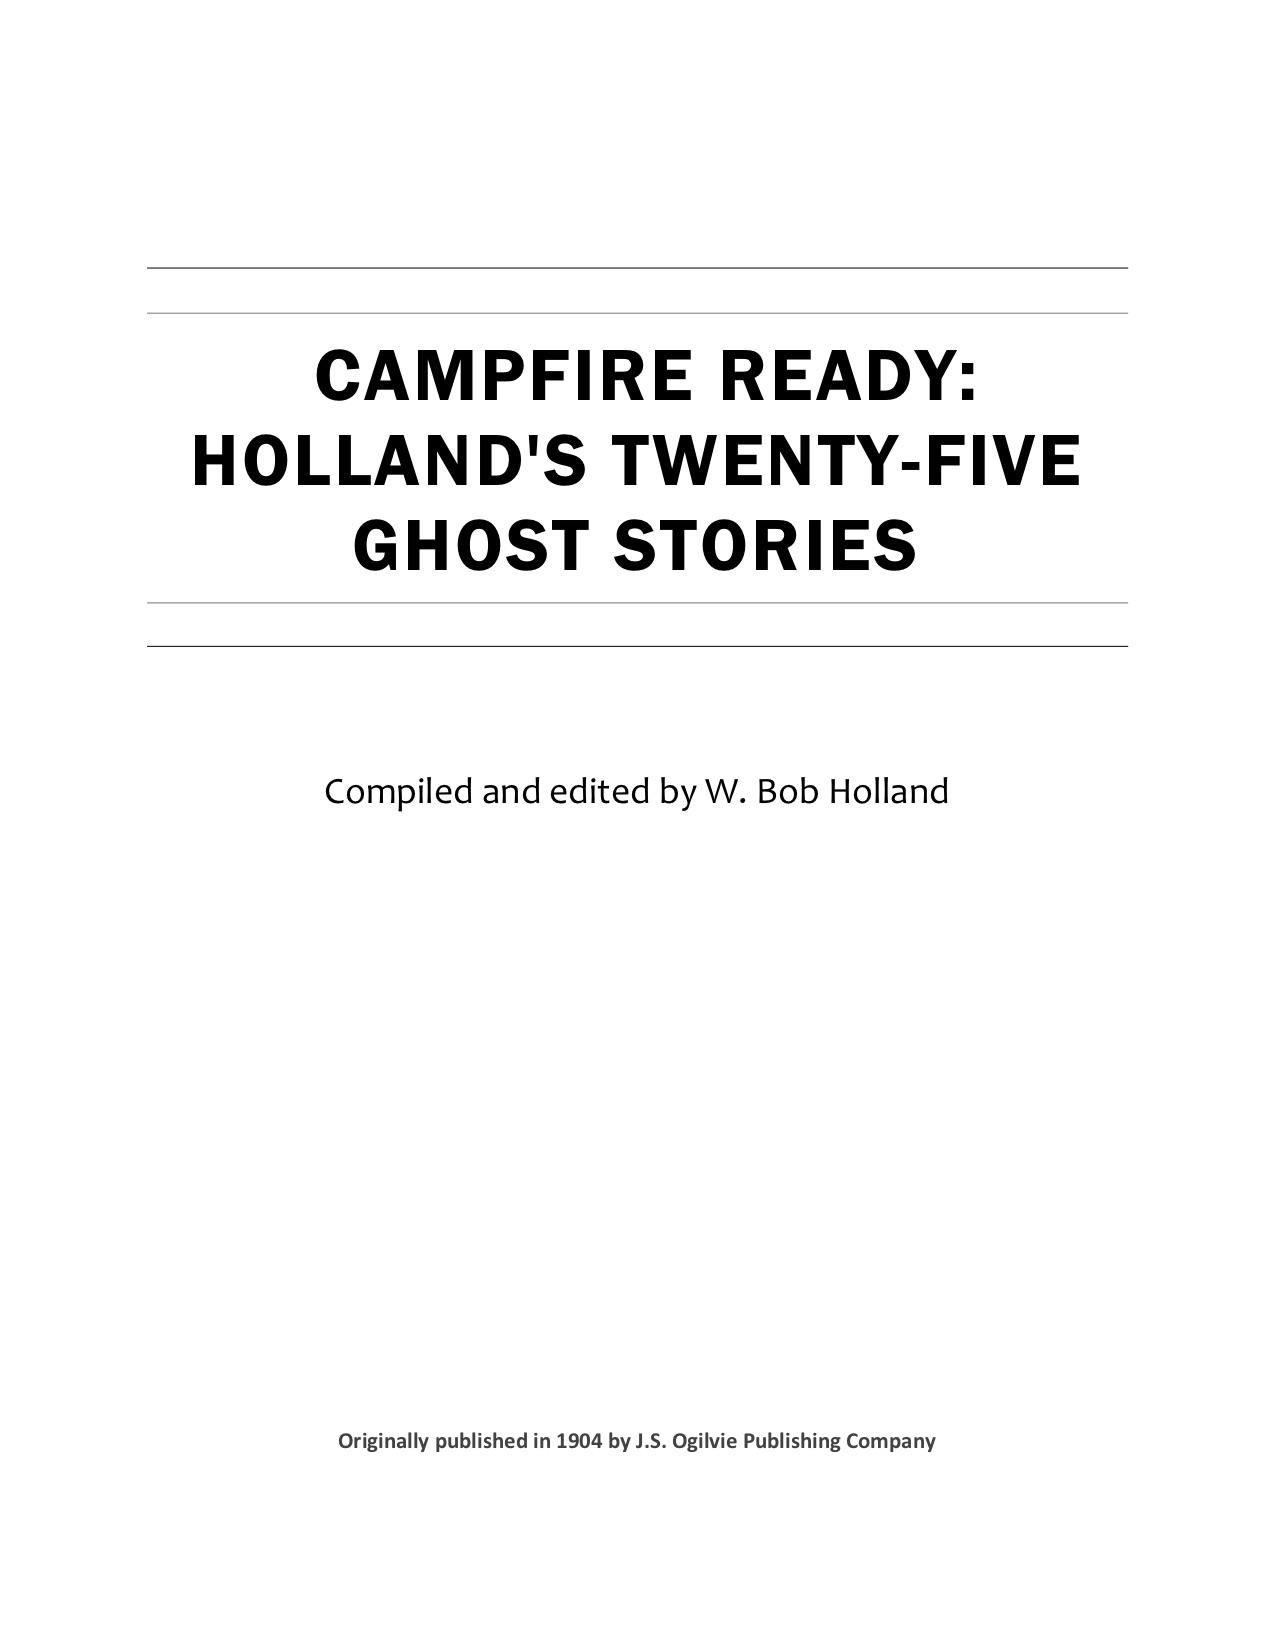 Campfire Ready_Sample